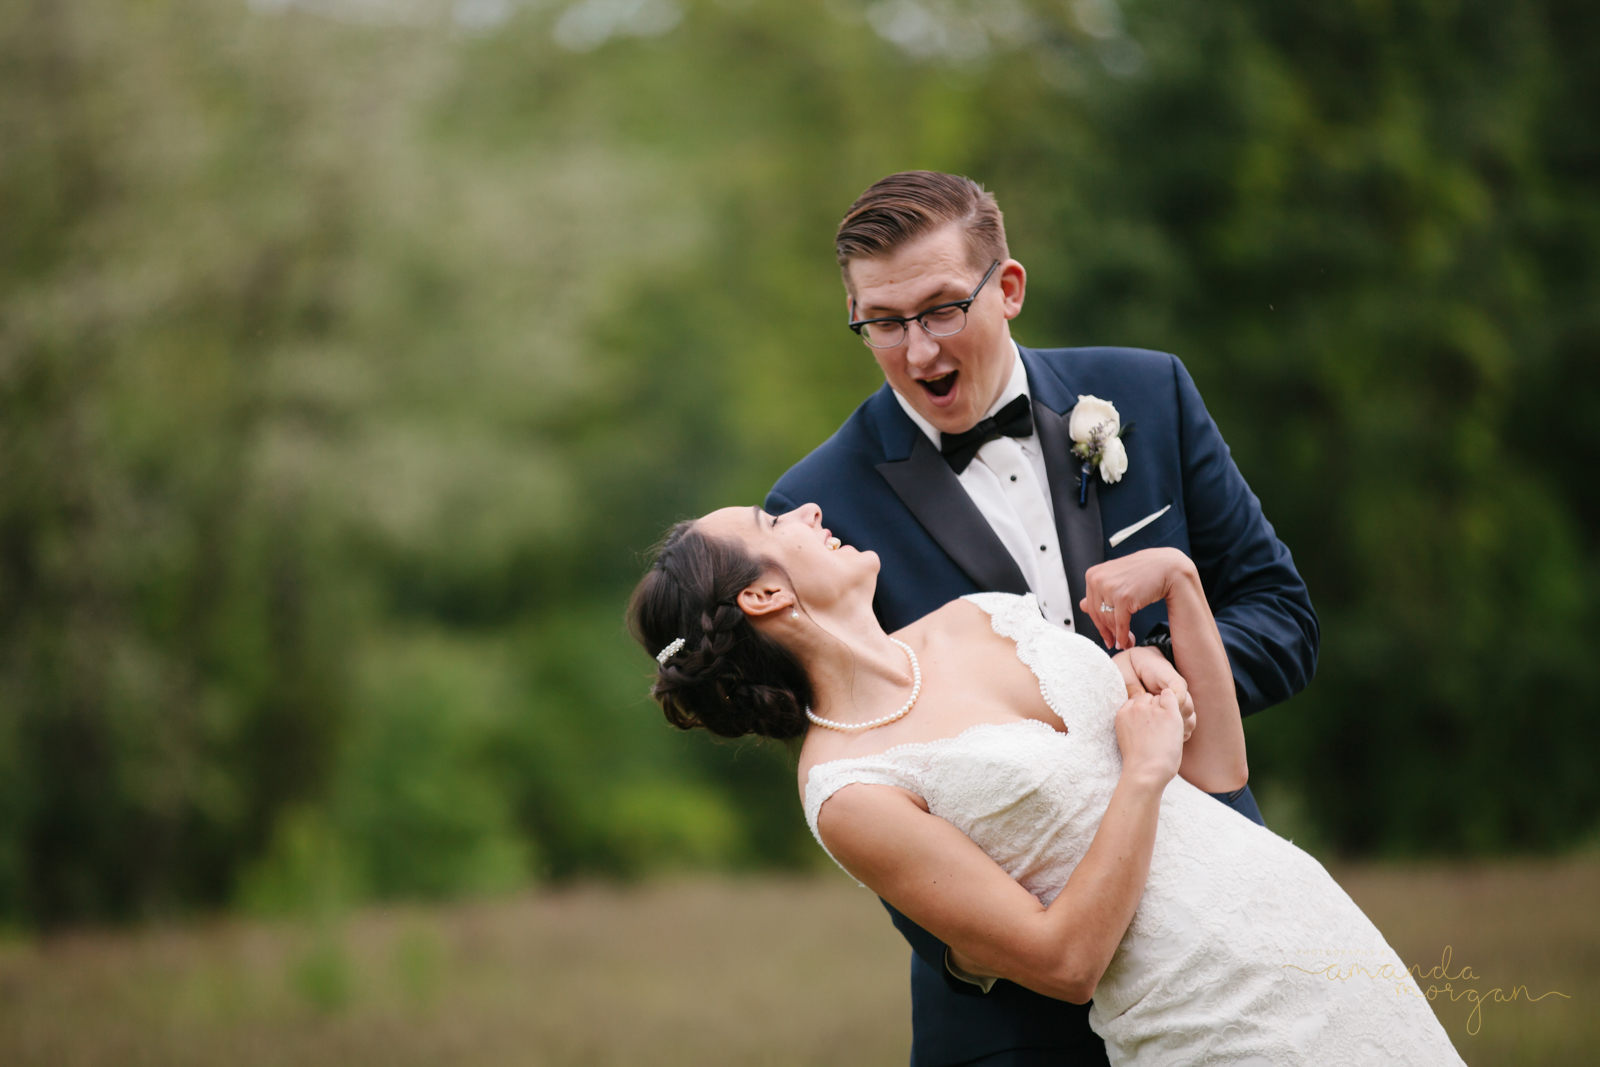 Publick-House-Wedding-Amanda-Morgan-21.jpg